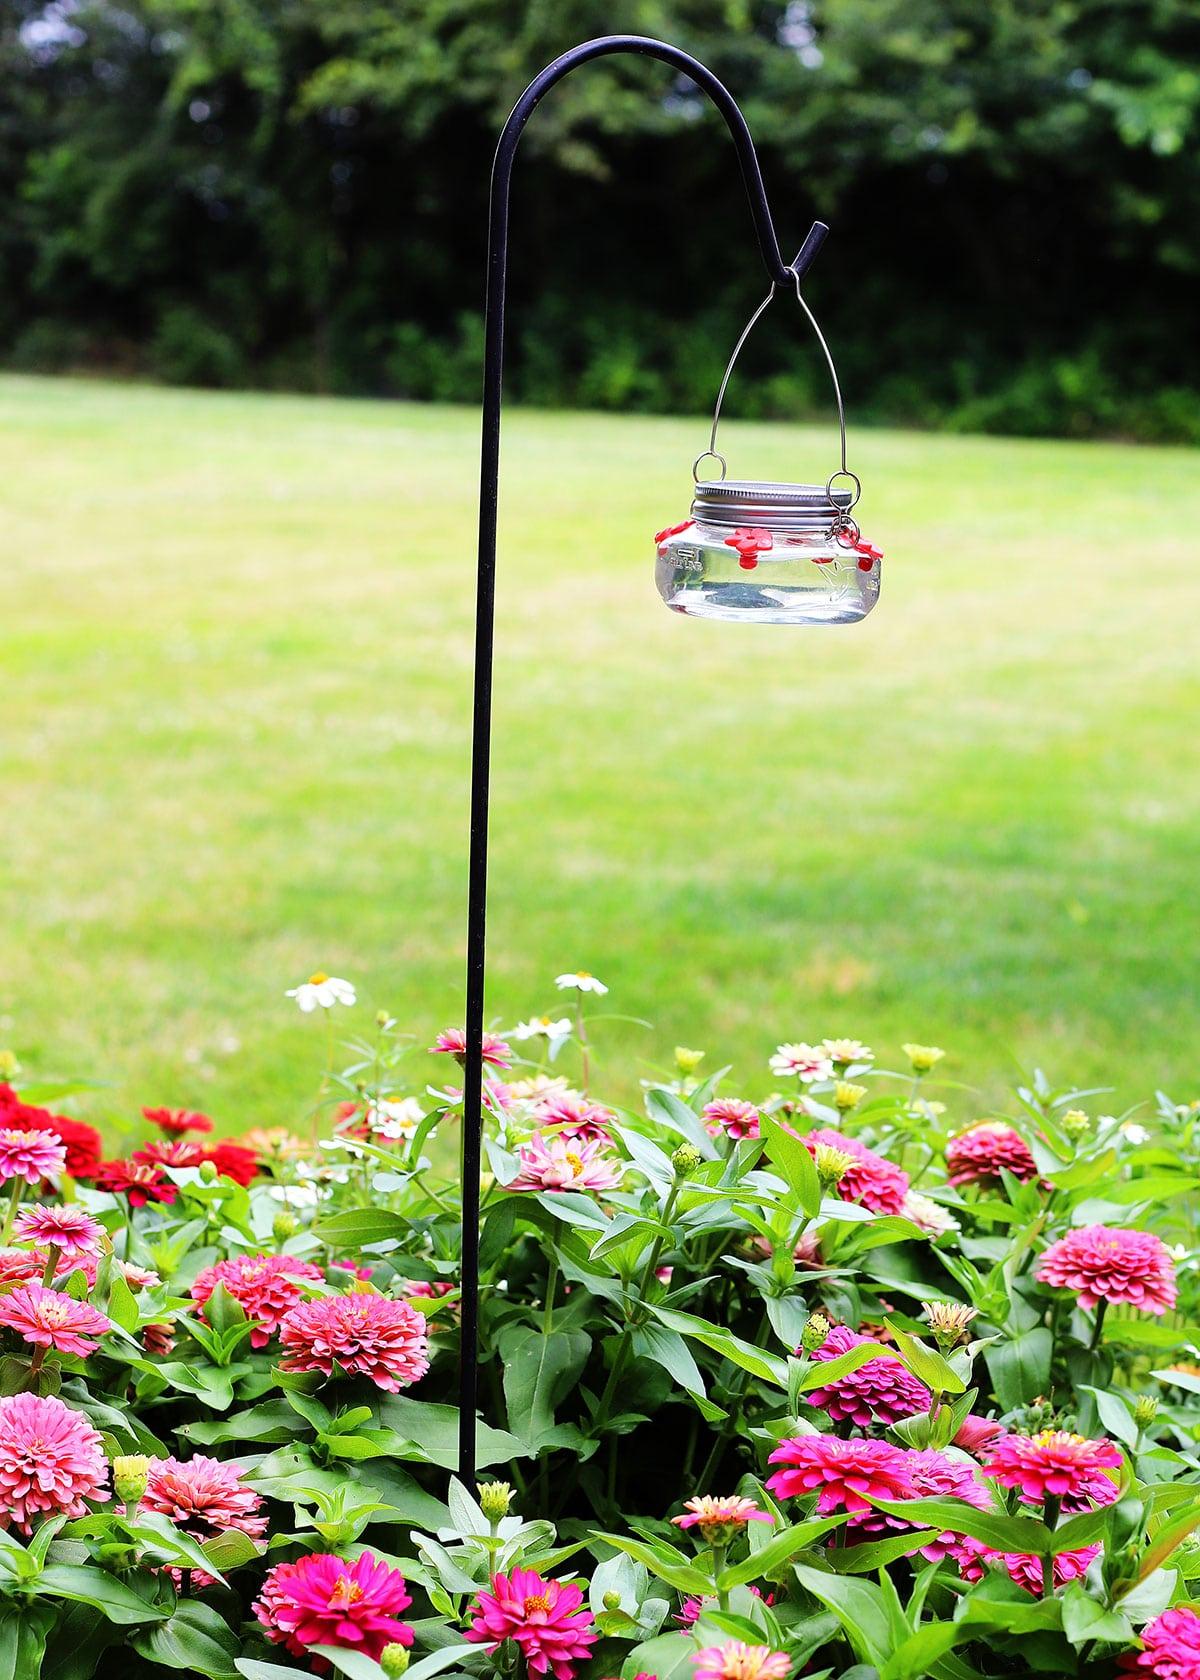 Hummingbird feeder in backyard surrounded by zinnia flowers.